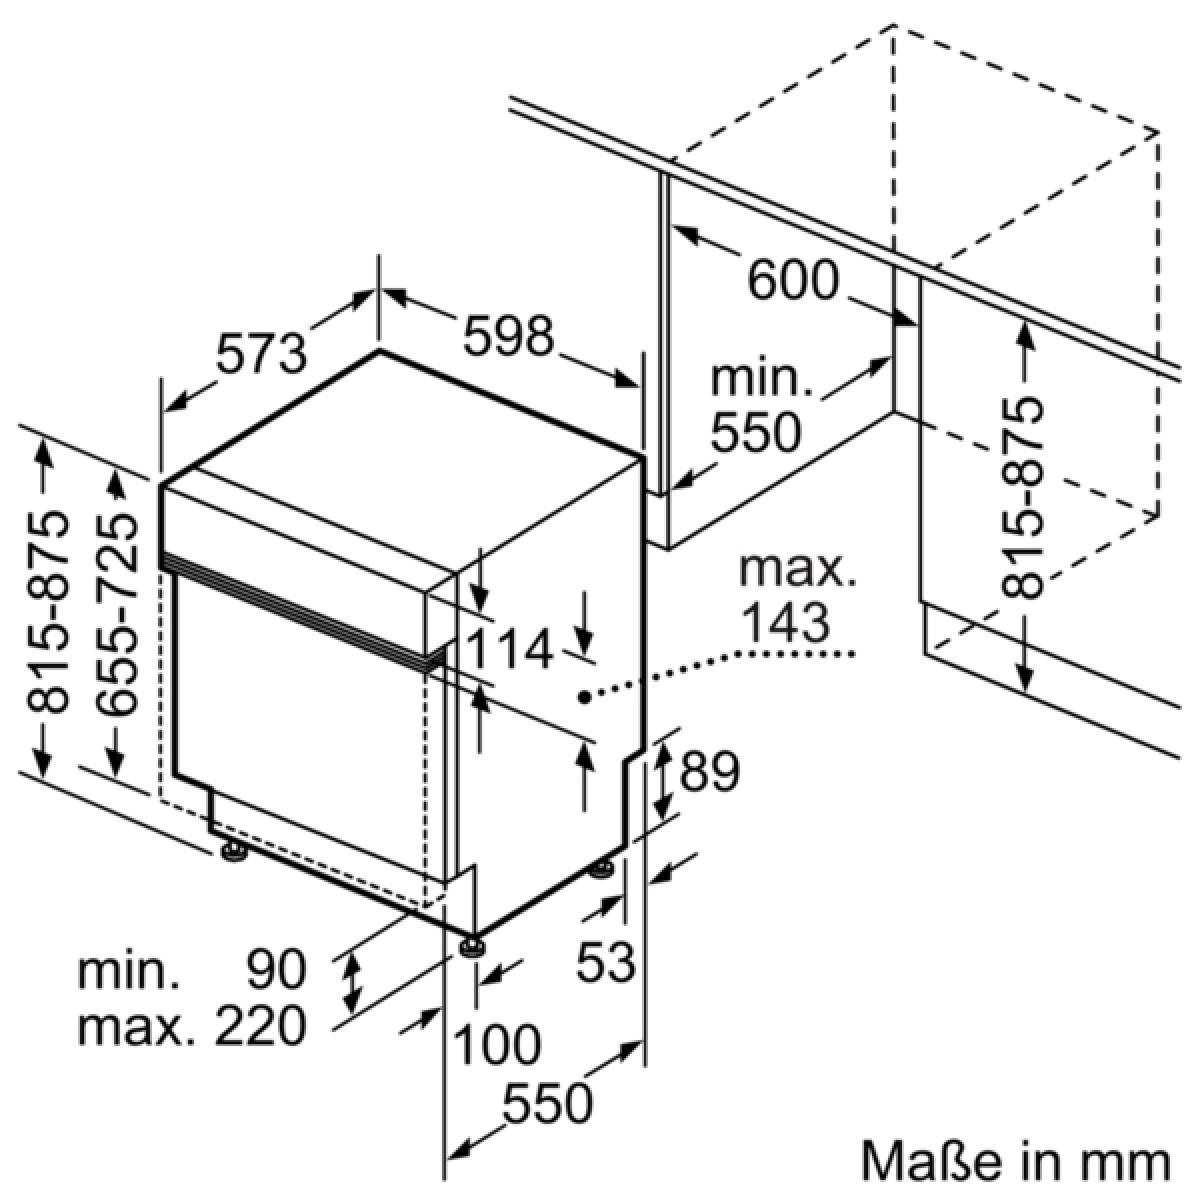 siemens sn536s00ae integrierbar edelstahl geschirrsp ler 60 cm g nstig kaufen. Black Bedroom Furniture Sets. Home Design Ideas